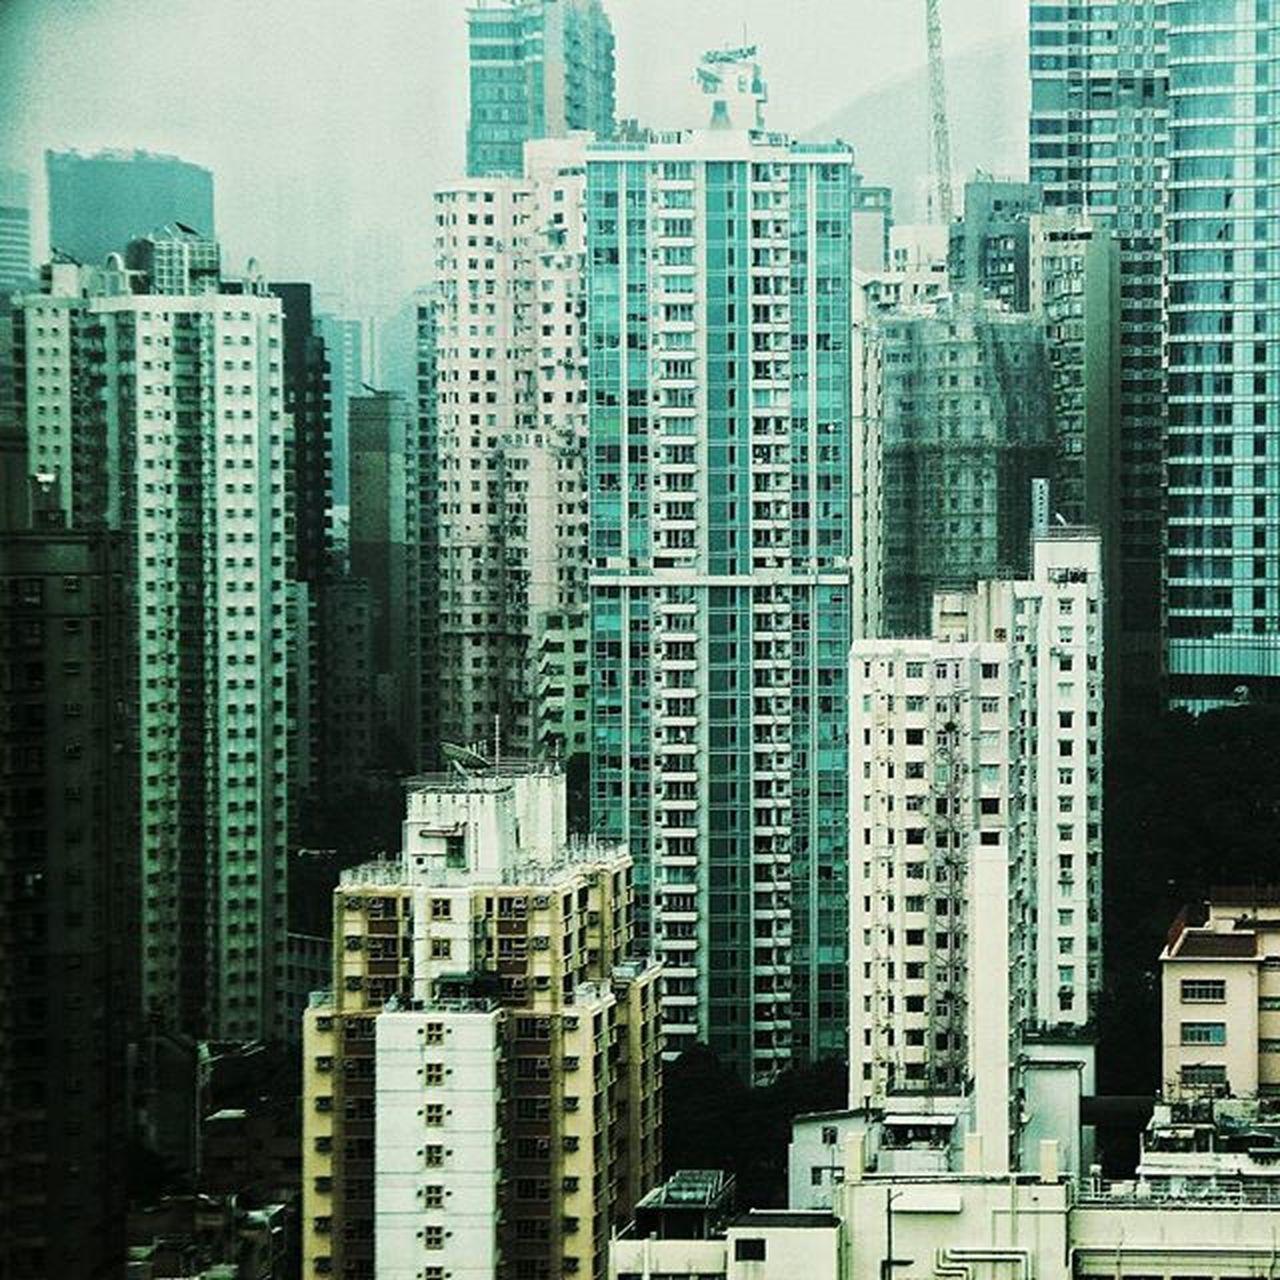 Hongkong cityscape HongKong Skyscraper Buildings City Hkig Hk Visithongkong Picoftheday Iginternational Igers Ig_travel @klikarbain